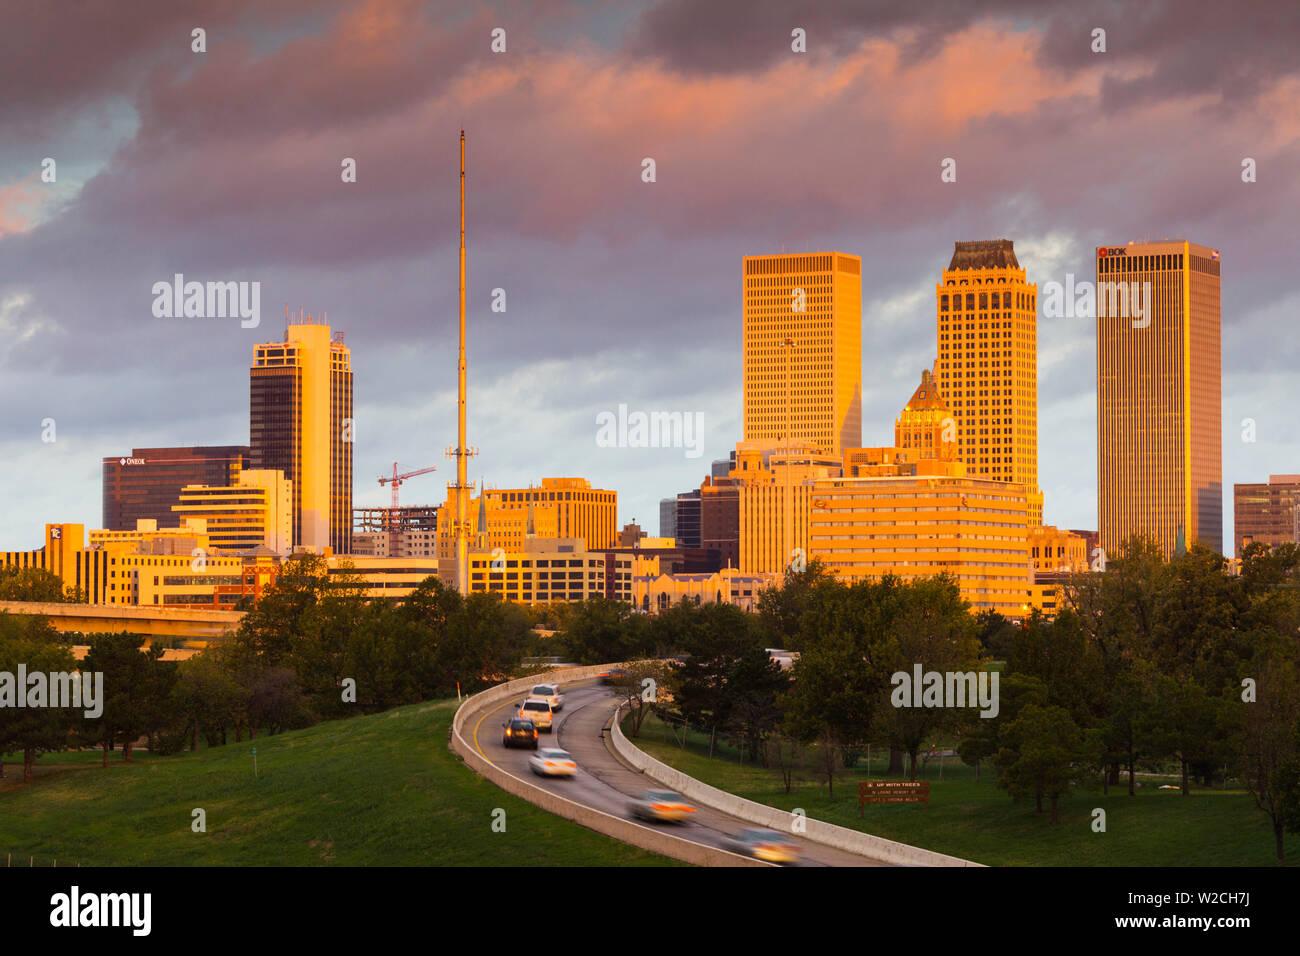 USA, Oklahoma, Tulsa, skyline from Route 75 Stock Photo